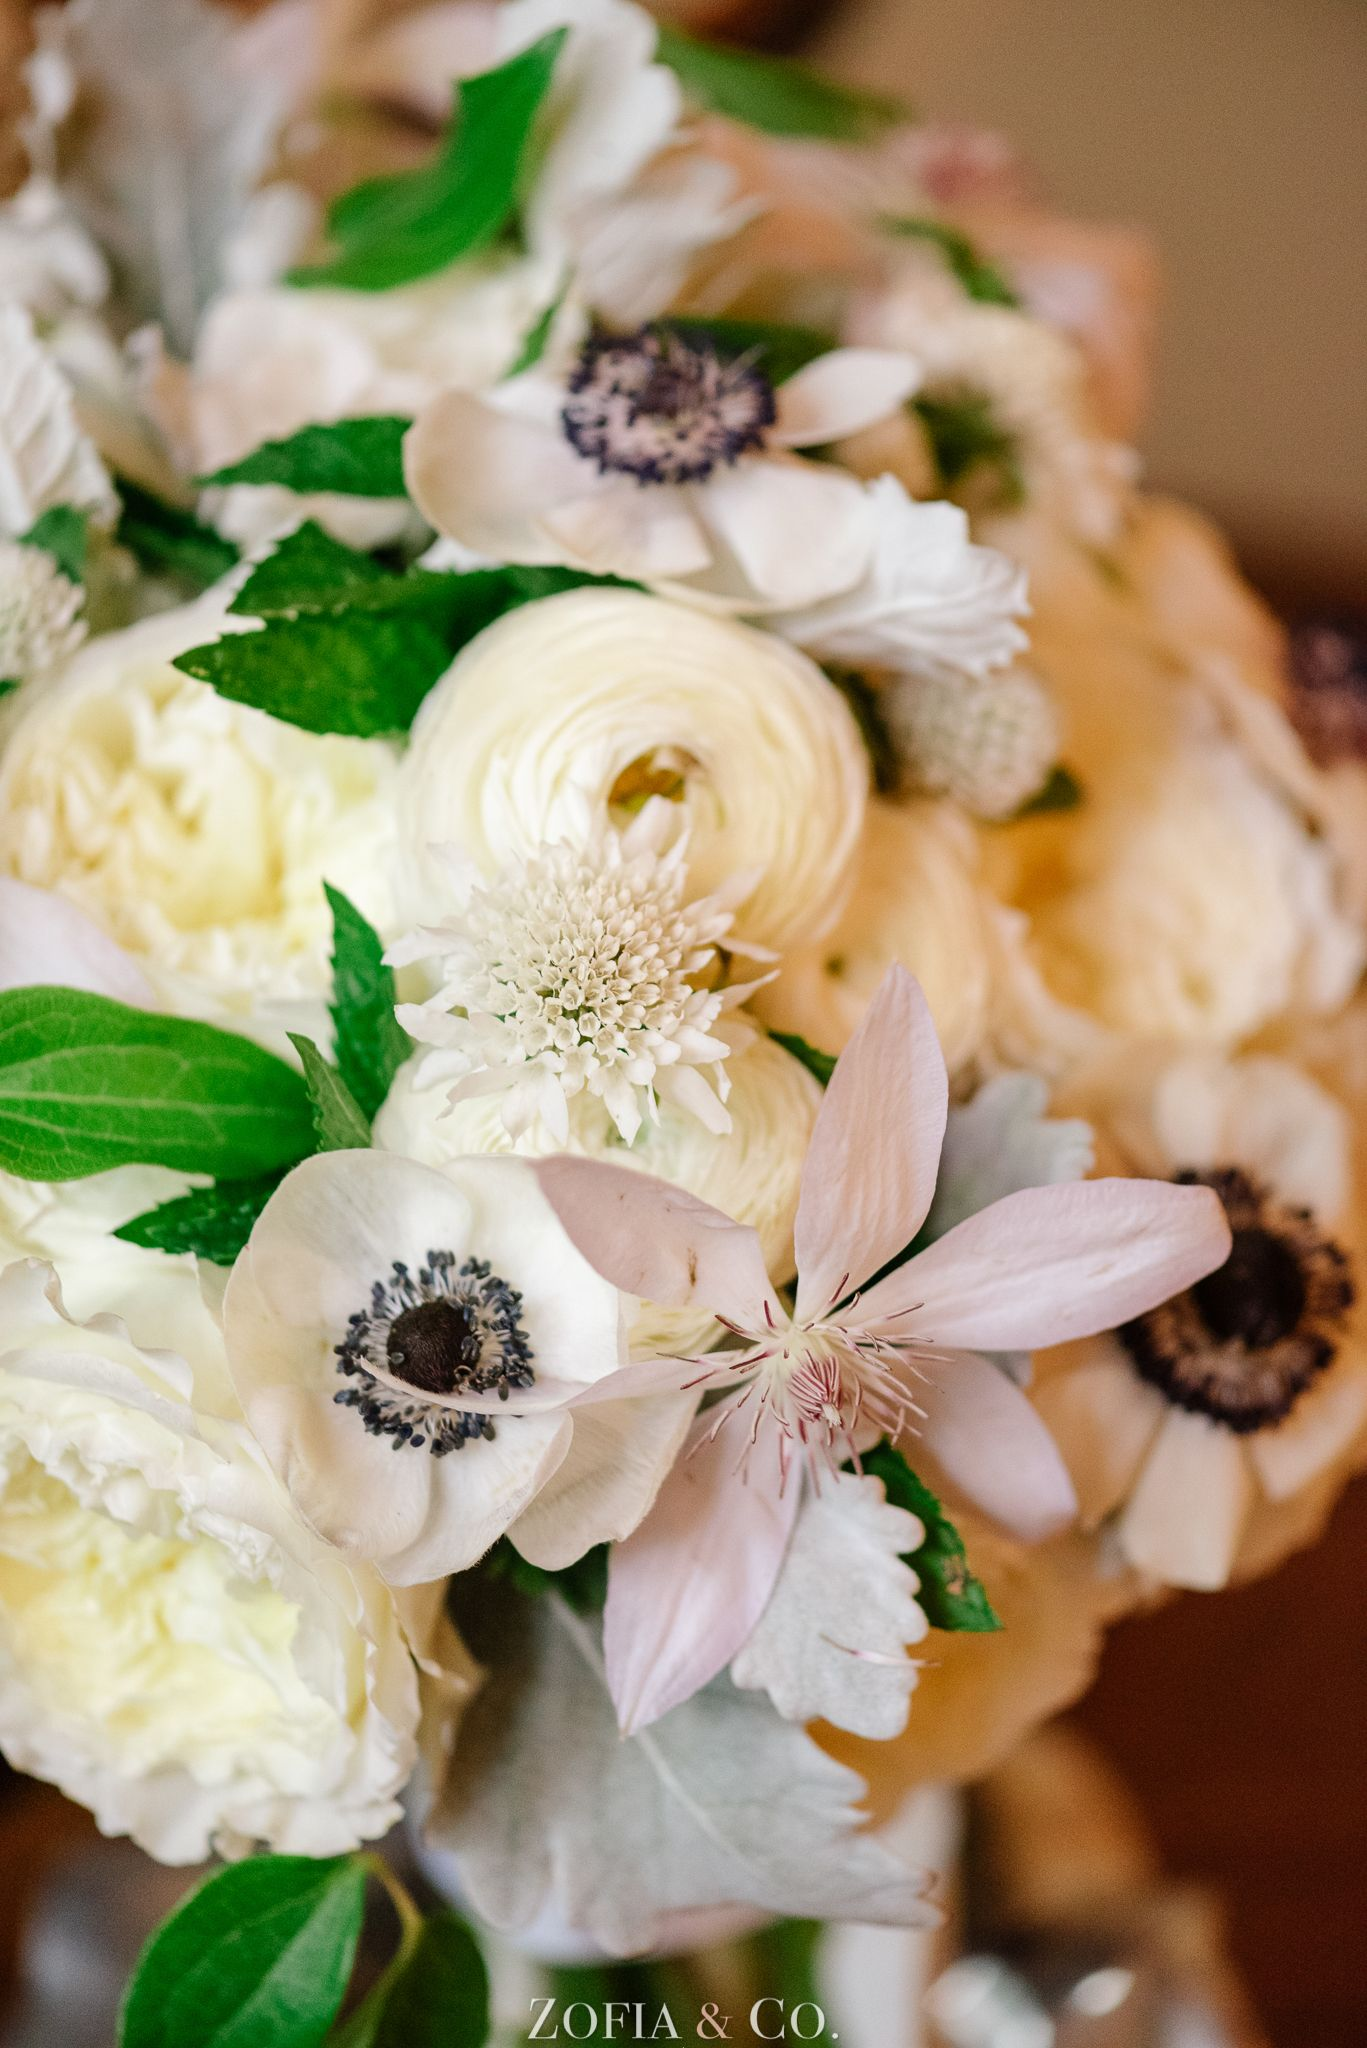 A rainy day creates an intimate wedding wedding bouquets ranunculus and anemone wedding bouquet photography zofia co izmirmasajfo